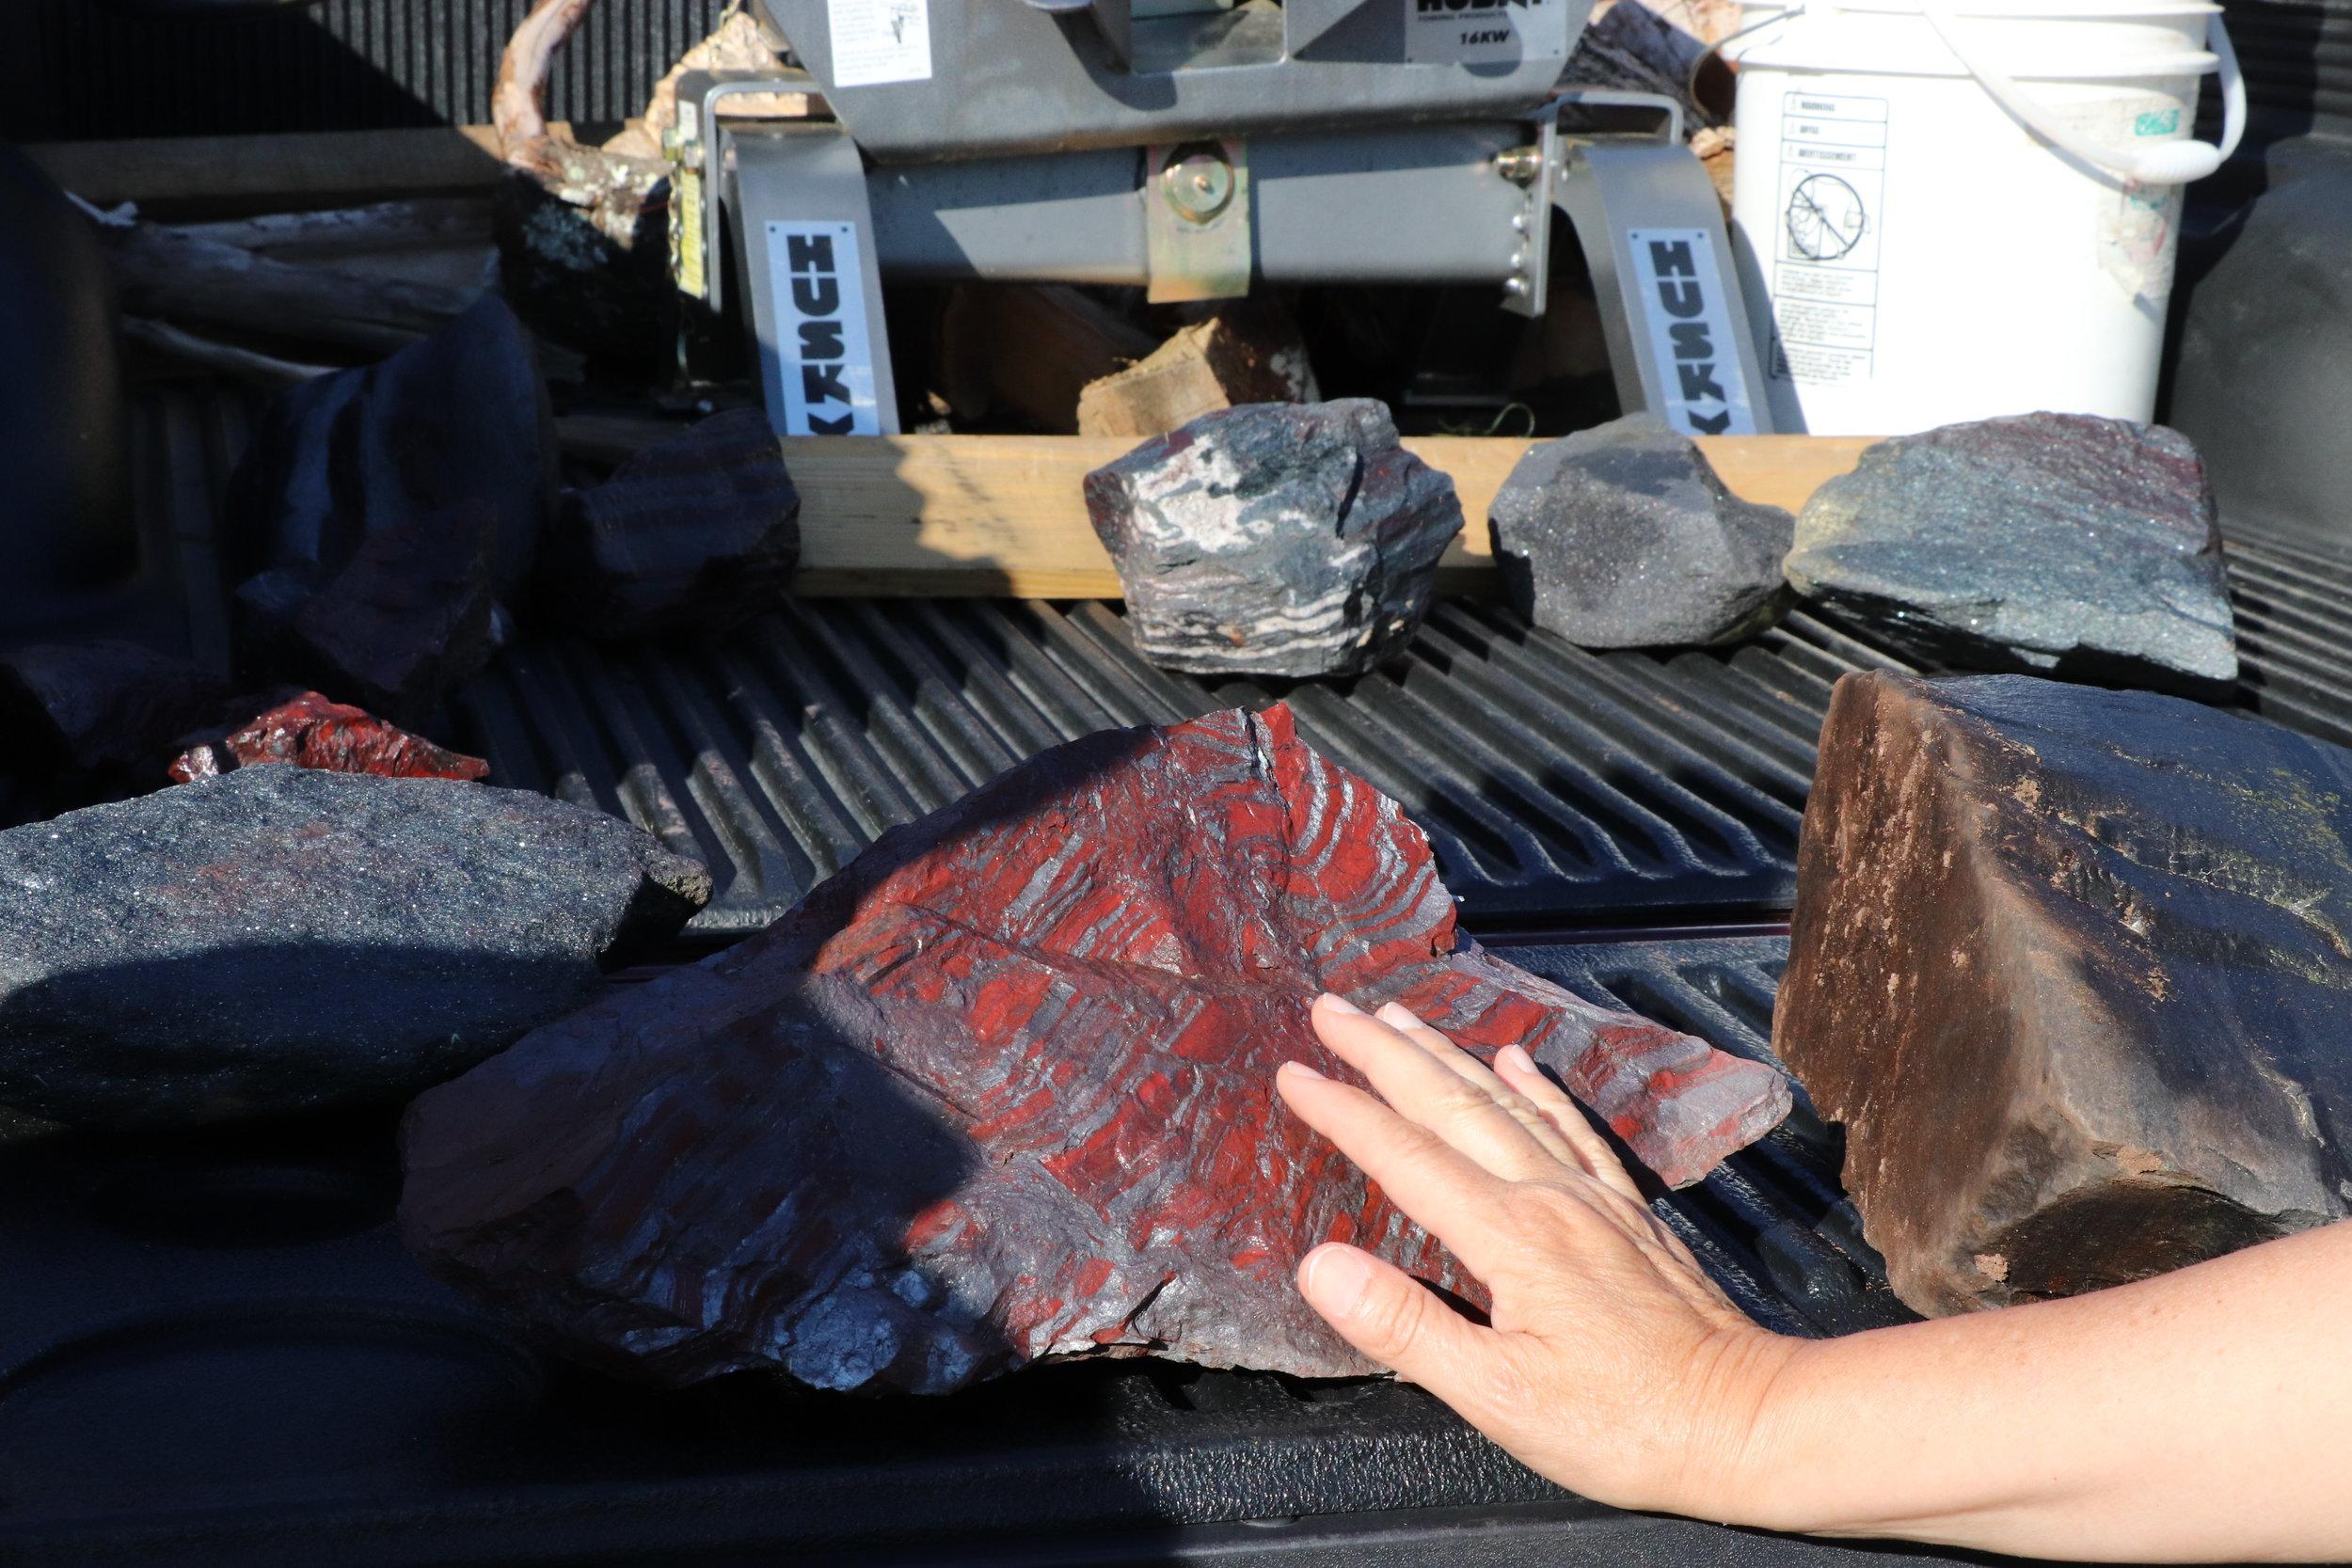 Jaspenlite - hematite with red quartz (jasper)